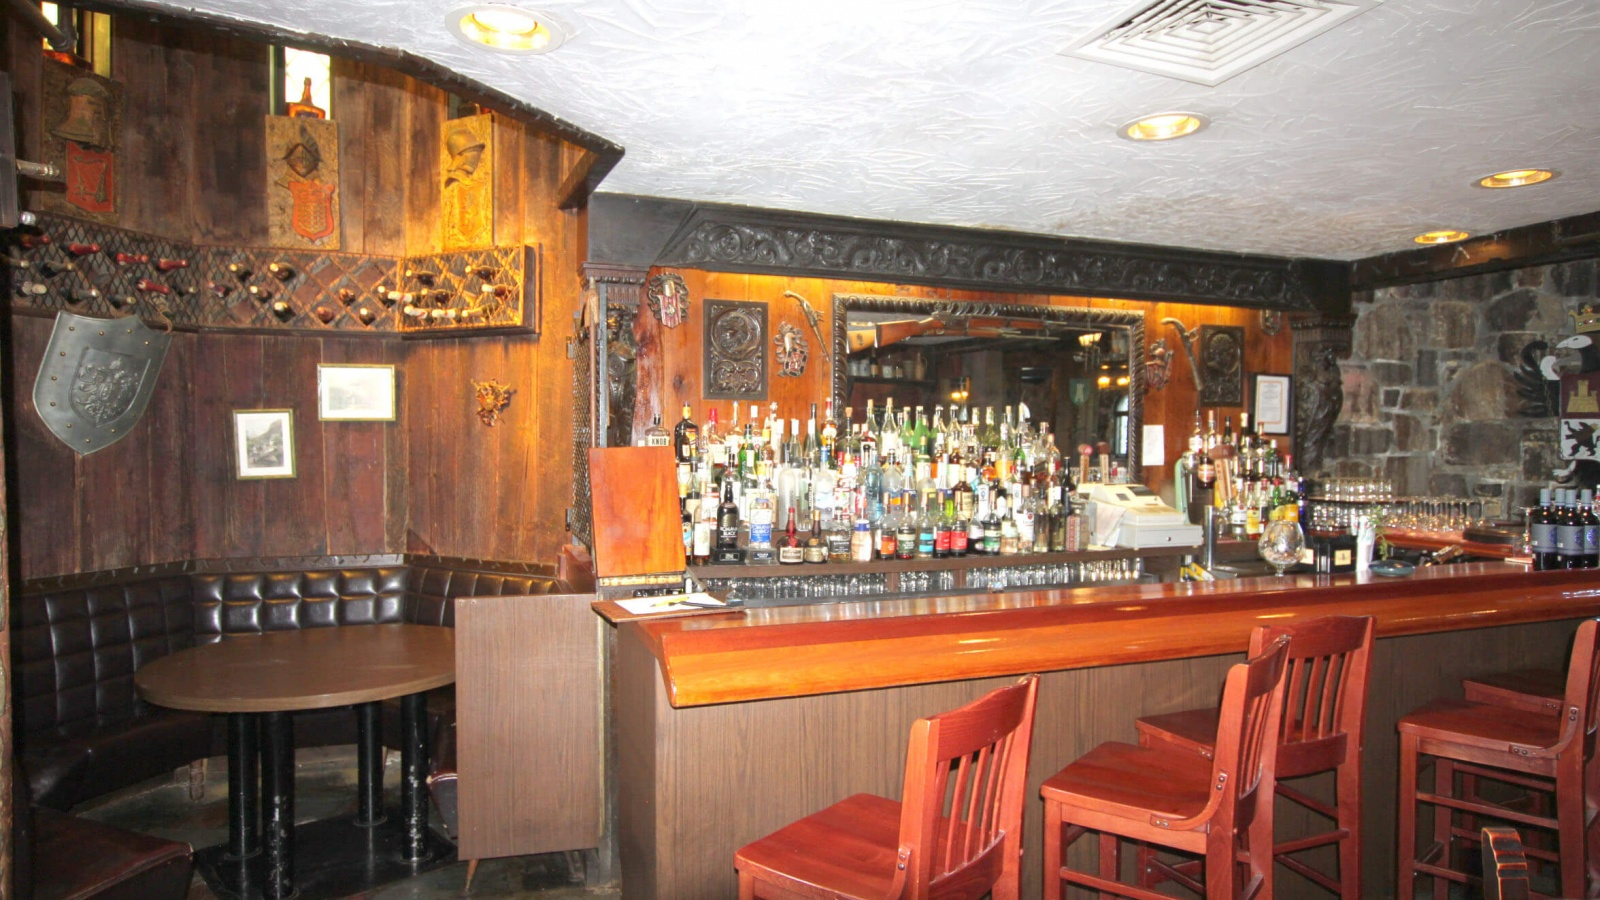 1230 Main Street, Leicester, Massachusetts 01524, Retail / Restaurant,For Sale,Main Street,1,1240